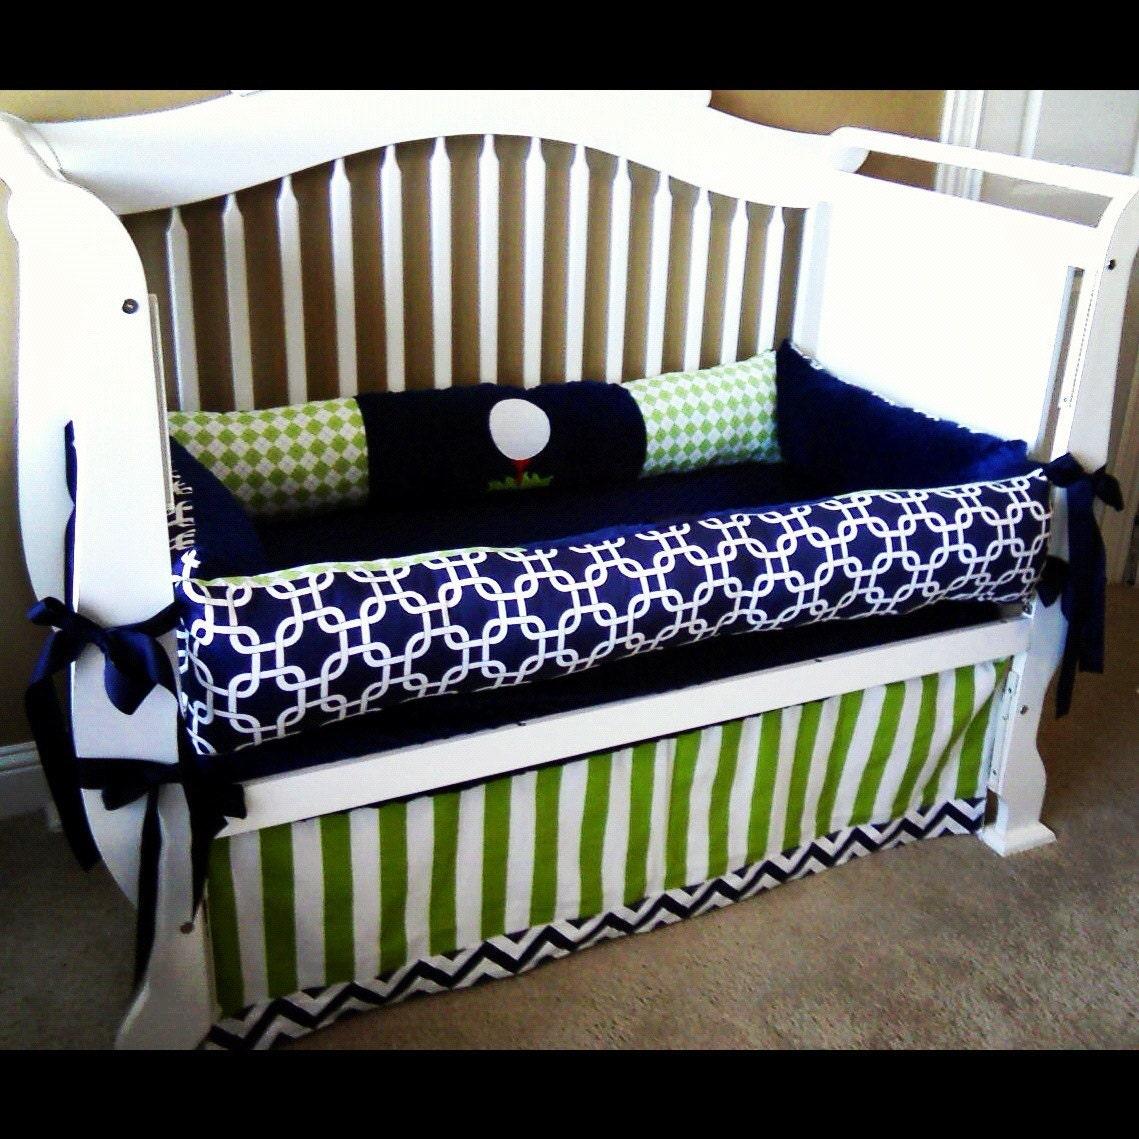 thane custom baby bedding crib set 3 pc set